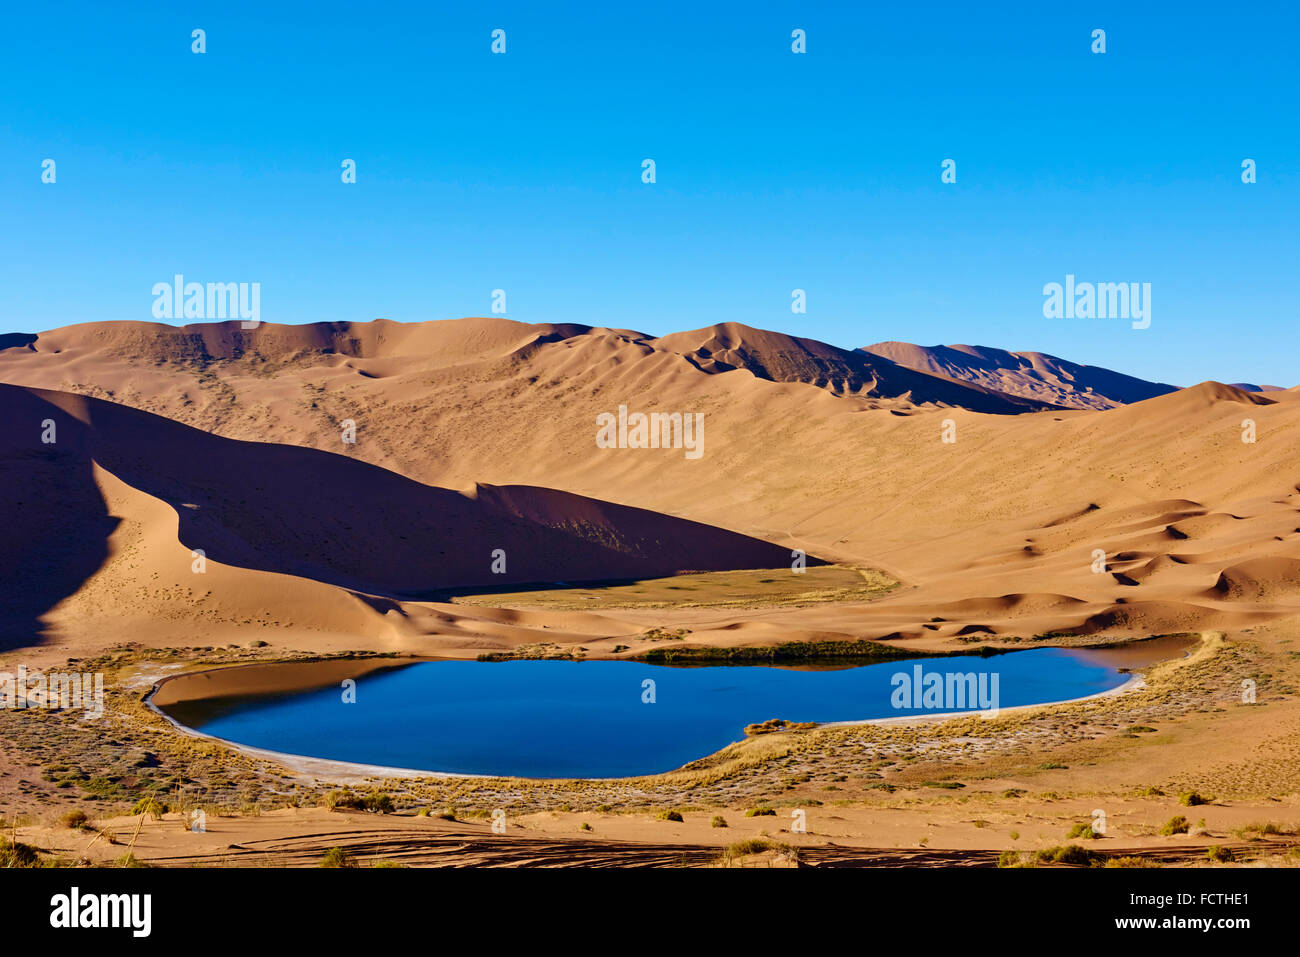 China, Inner Mongolia, Badain Jaran desert, Gobi desert - Stock Image